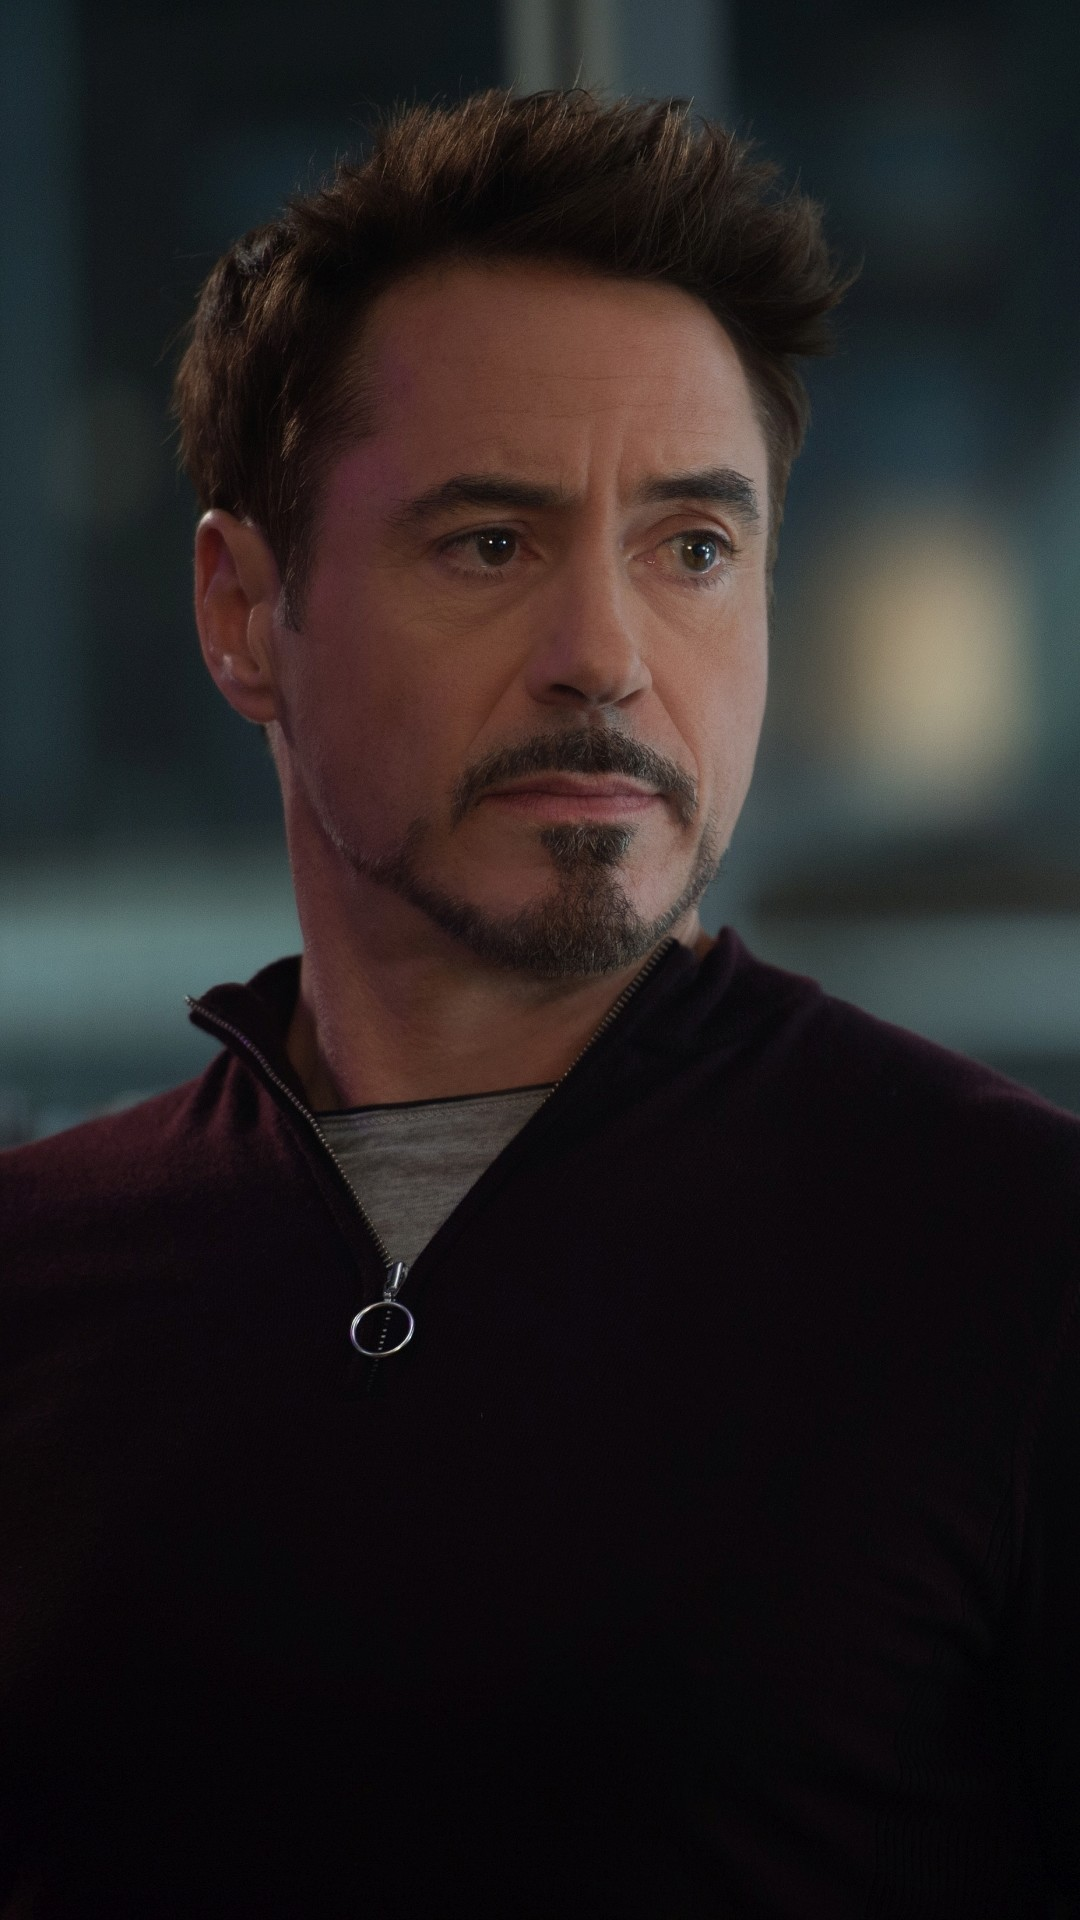 Robert Downey Jr Iron Man Wallpaper 71 images 1080x1920